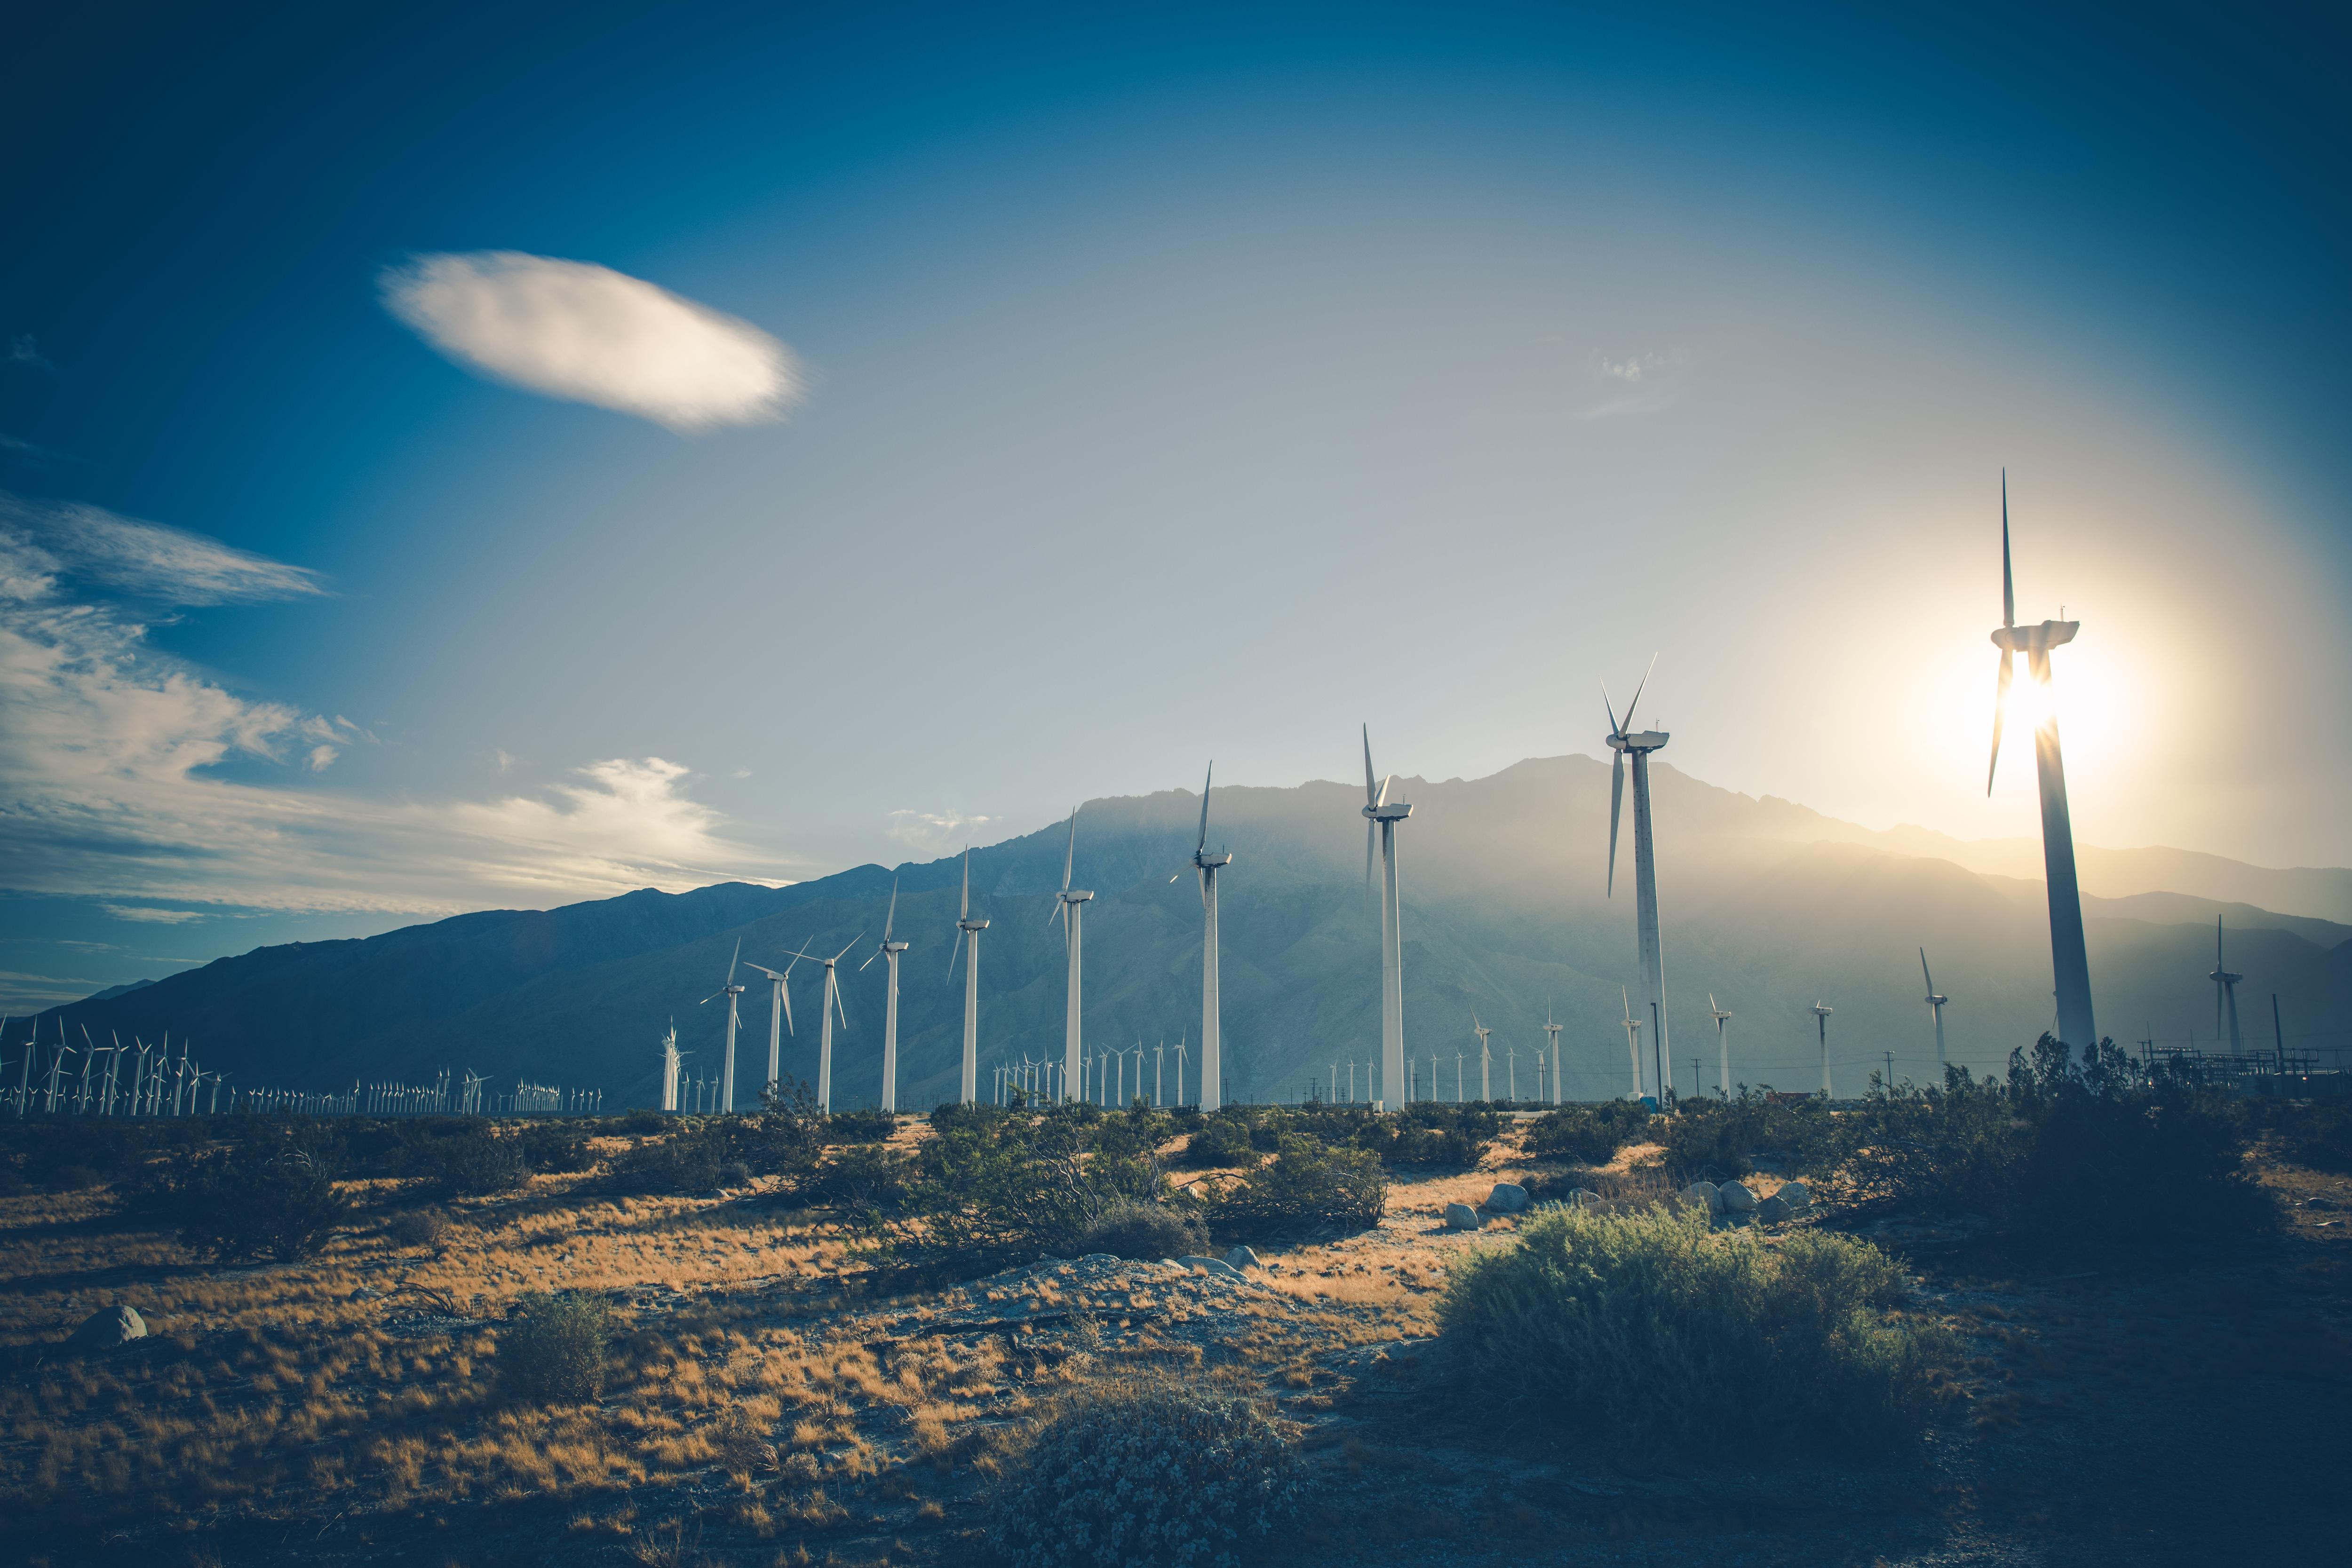 California Renewable Energy wind turbines